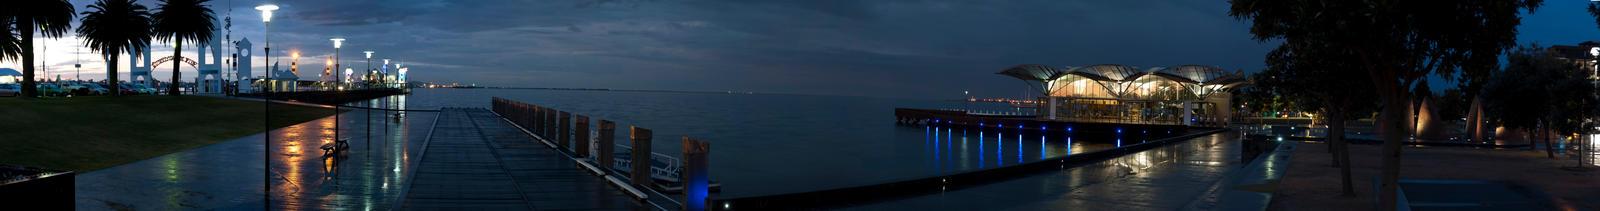 Waterfront Panorama By Night